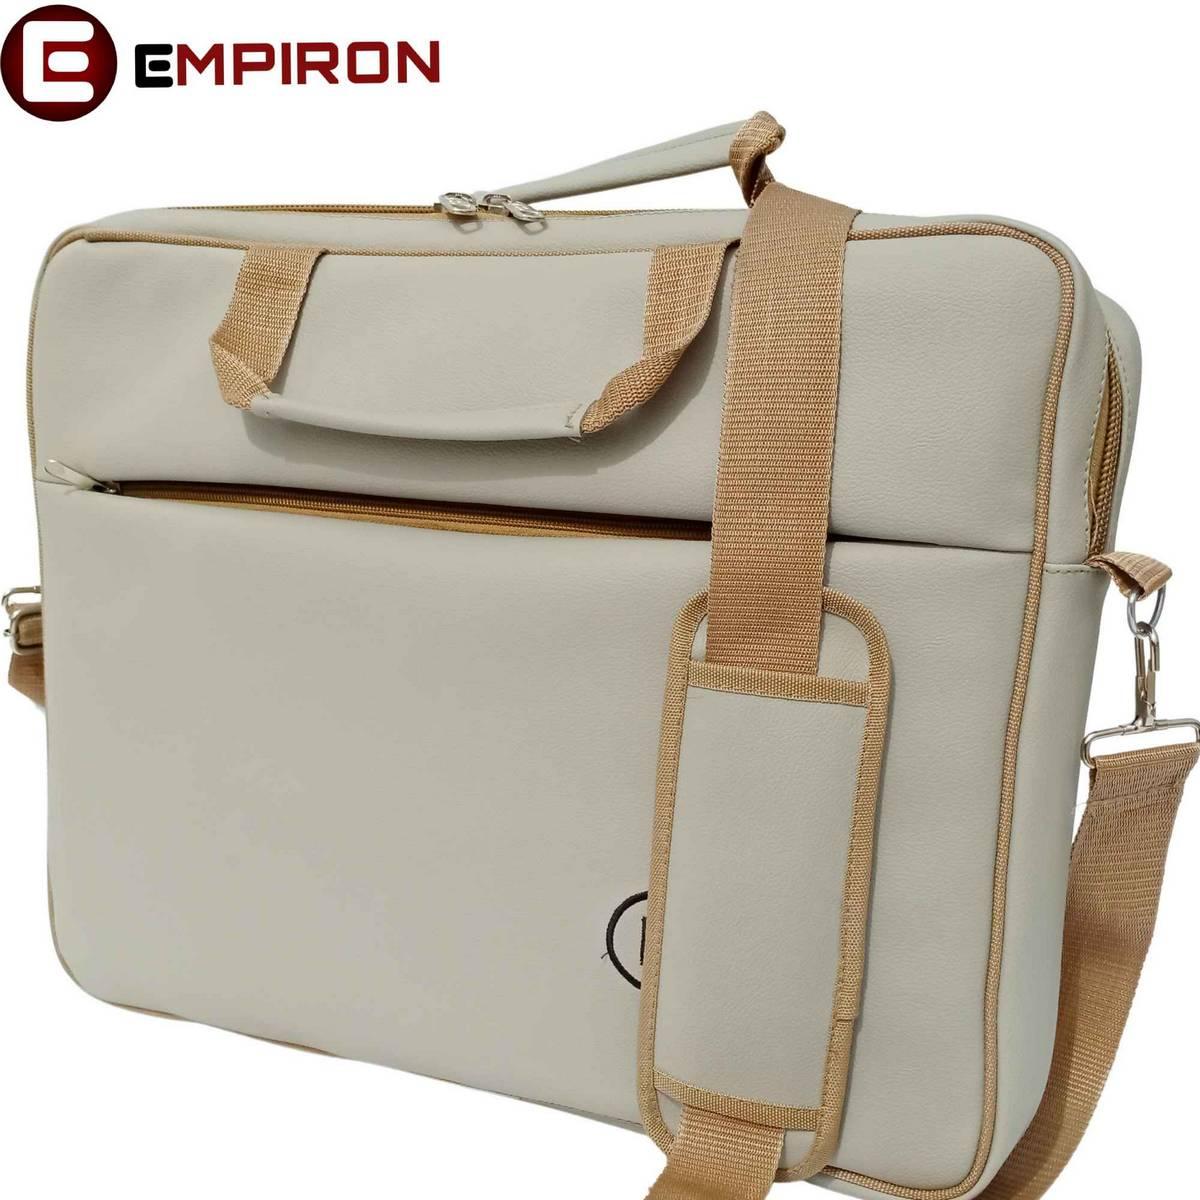 EMPIRON Laptop Bag PU Leather luxury notebook bag promotional laptop sleeve Waterproof Bag ELBSF02